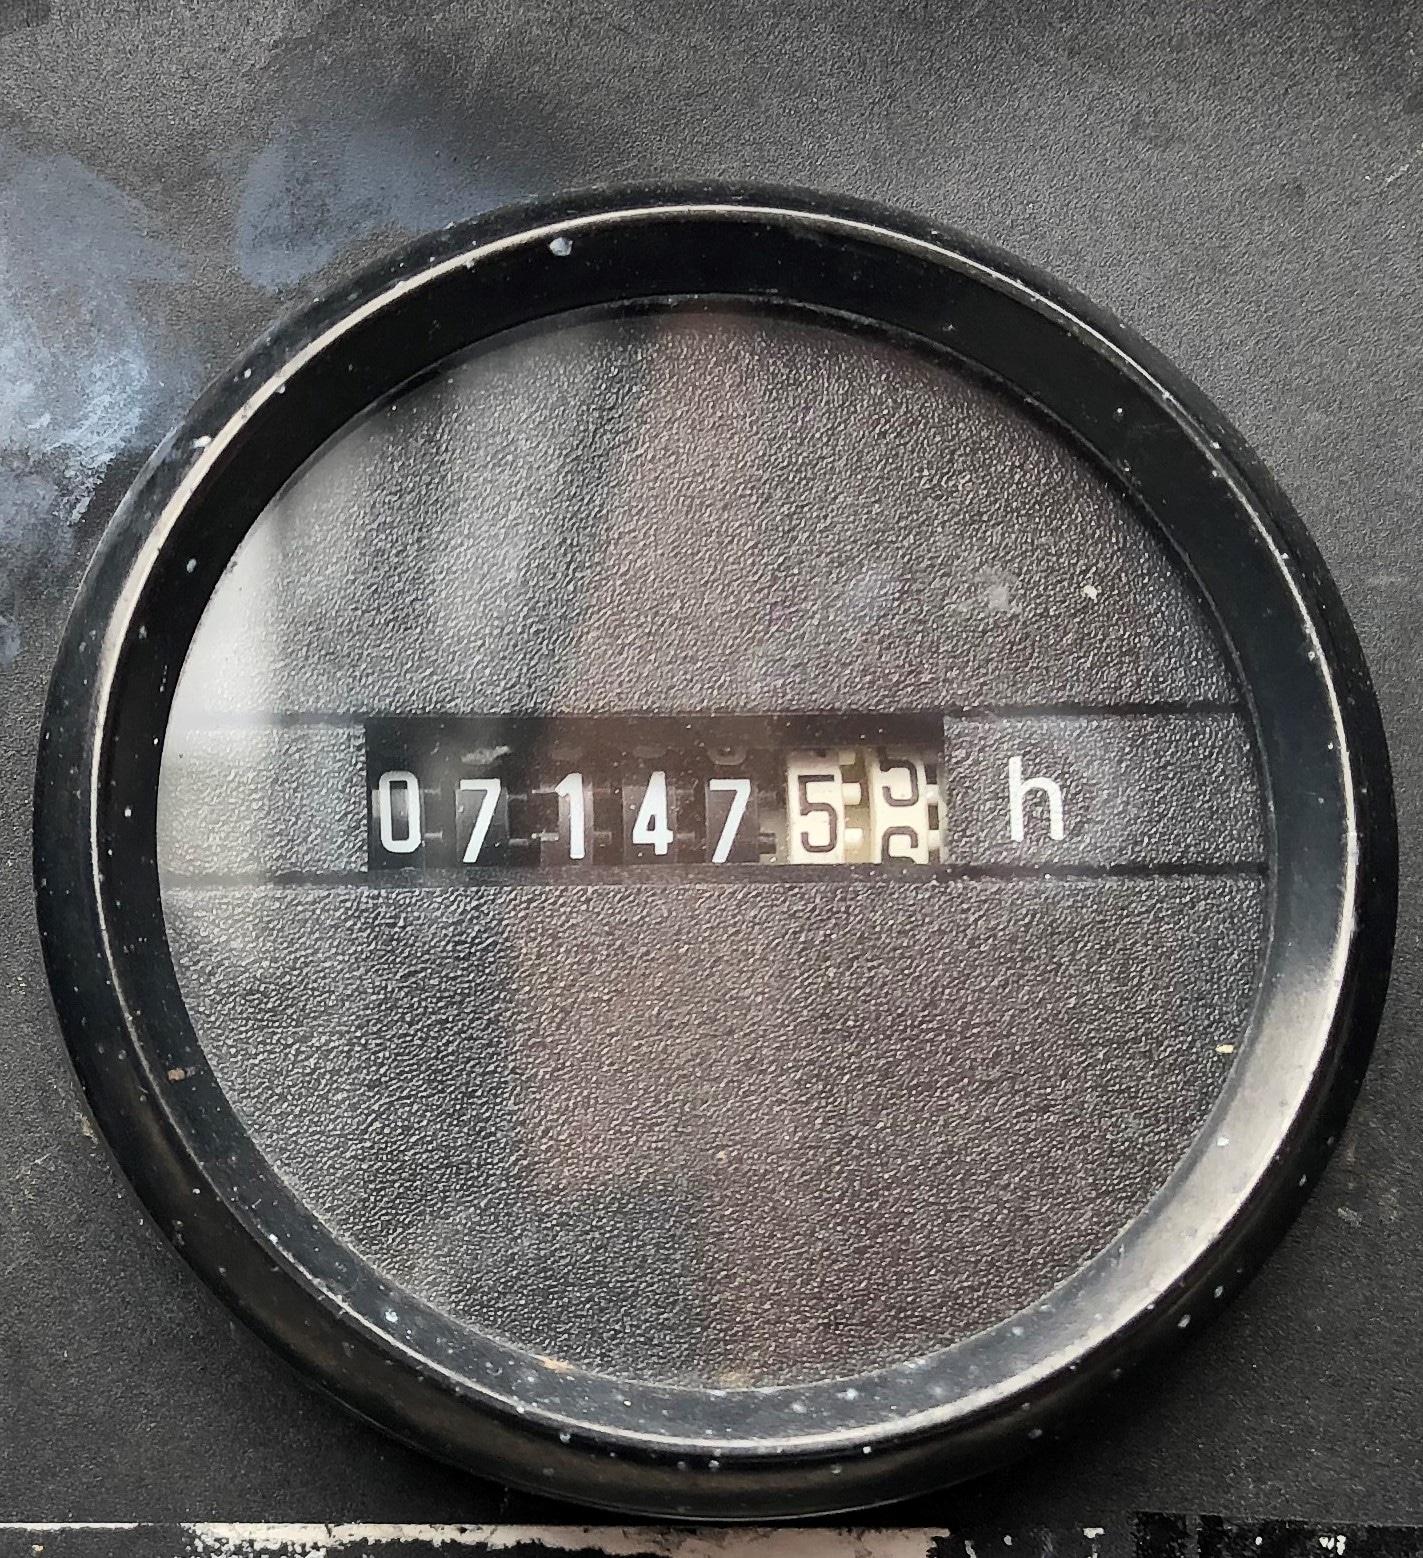 200 Kva FG Wilson Perkins/Leroy Acoustic (Rental Specs) Generator hours